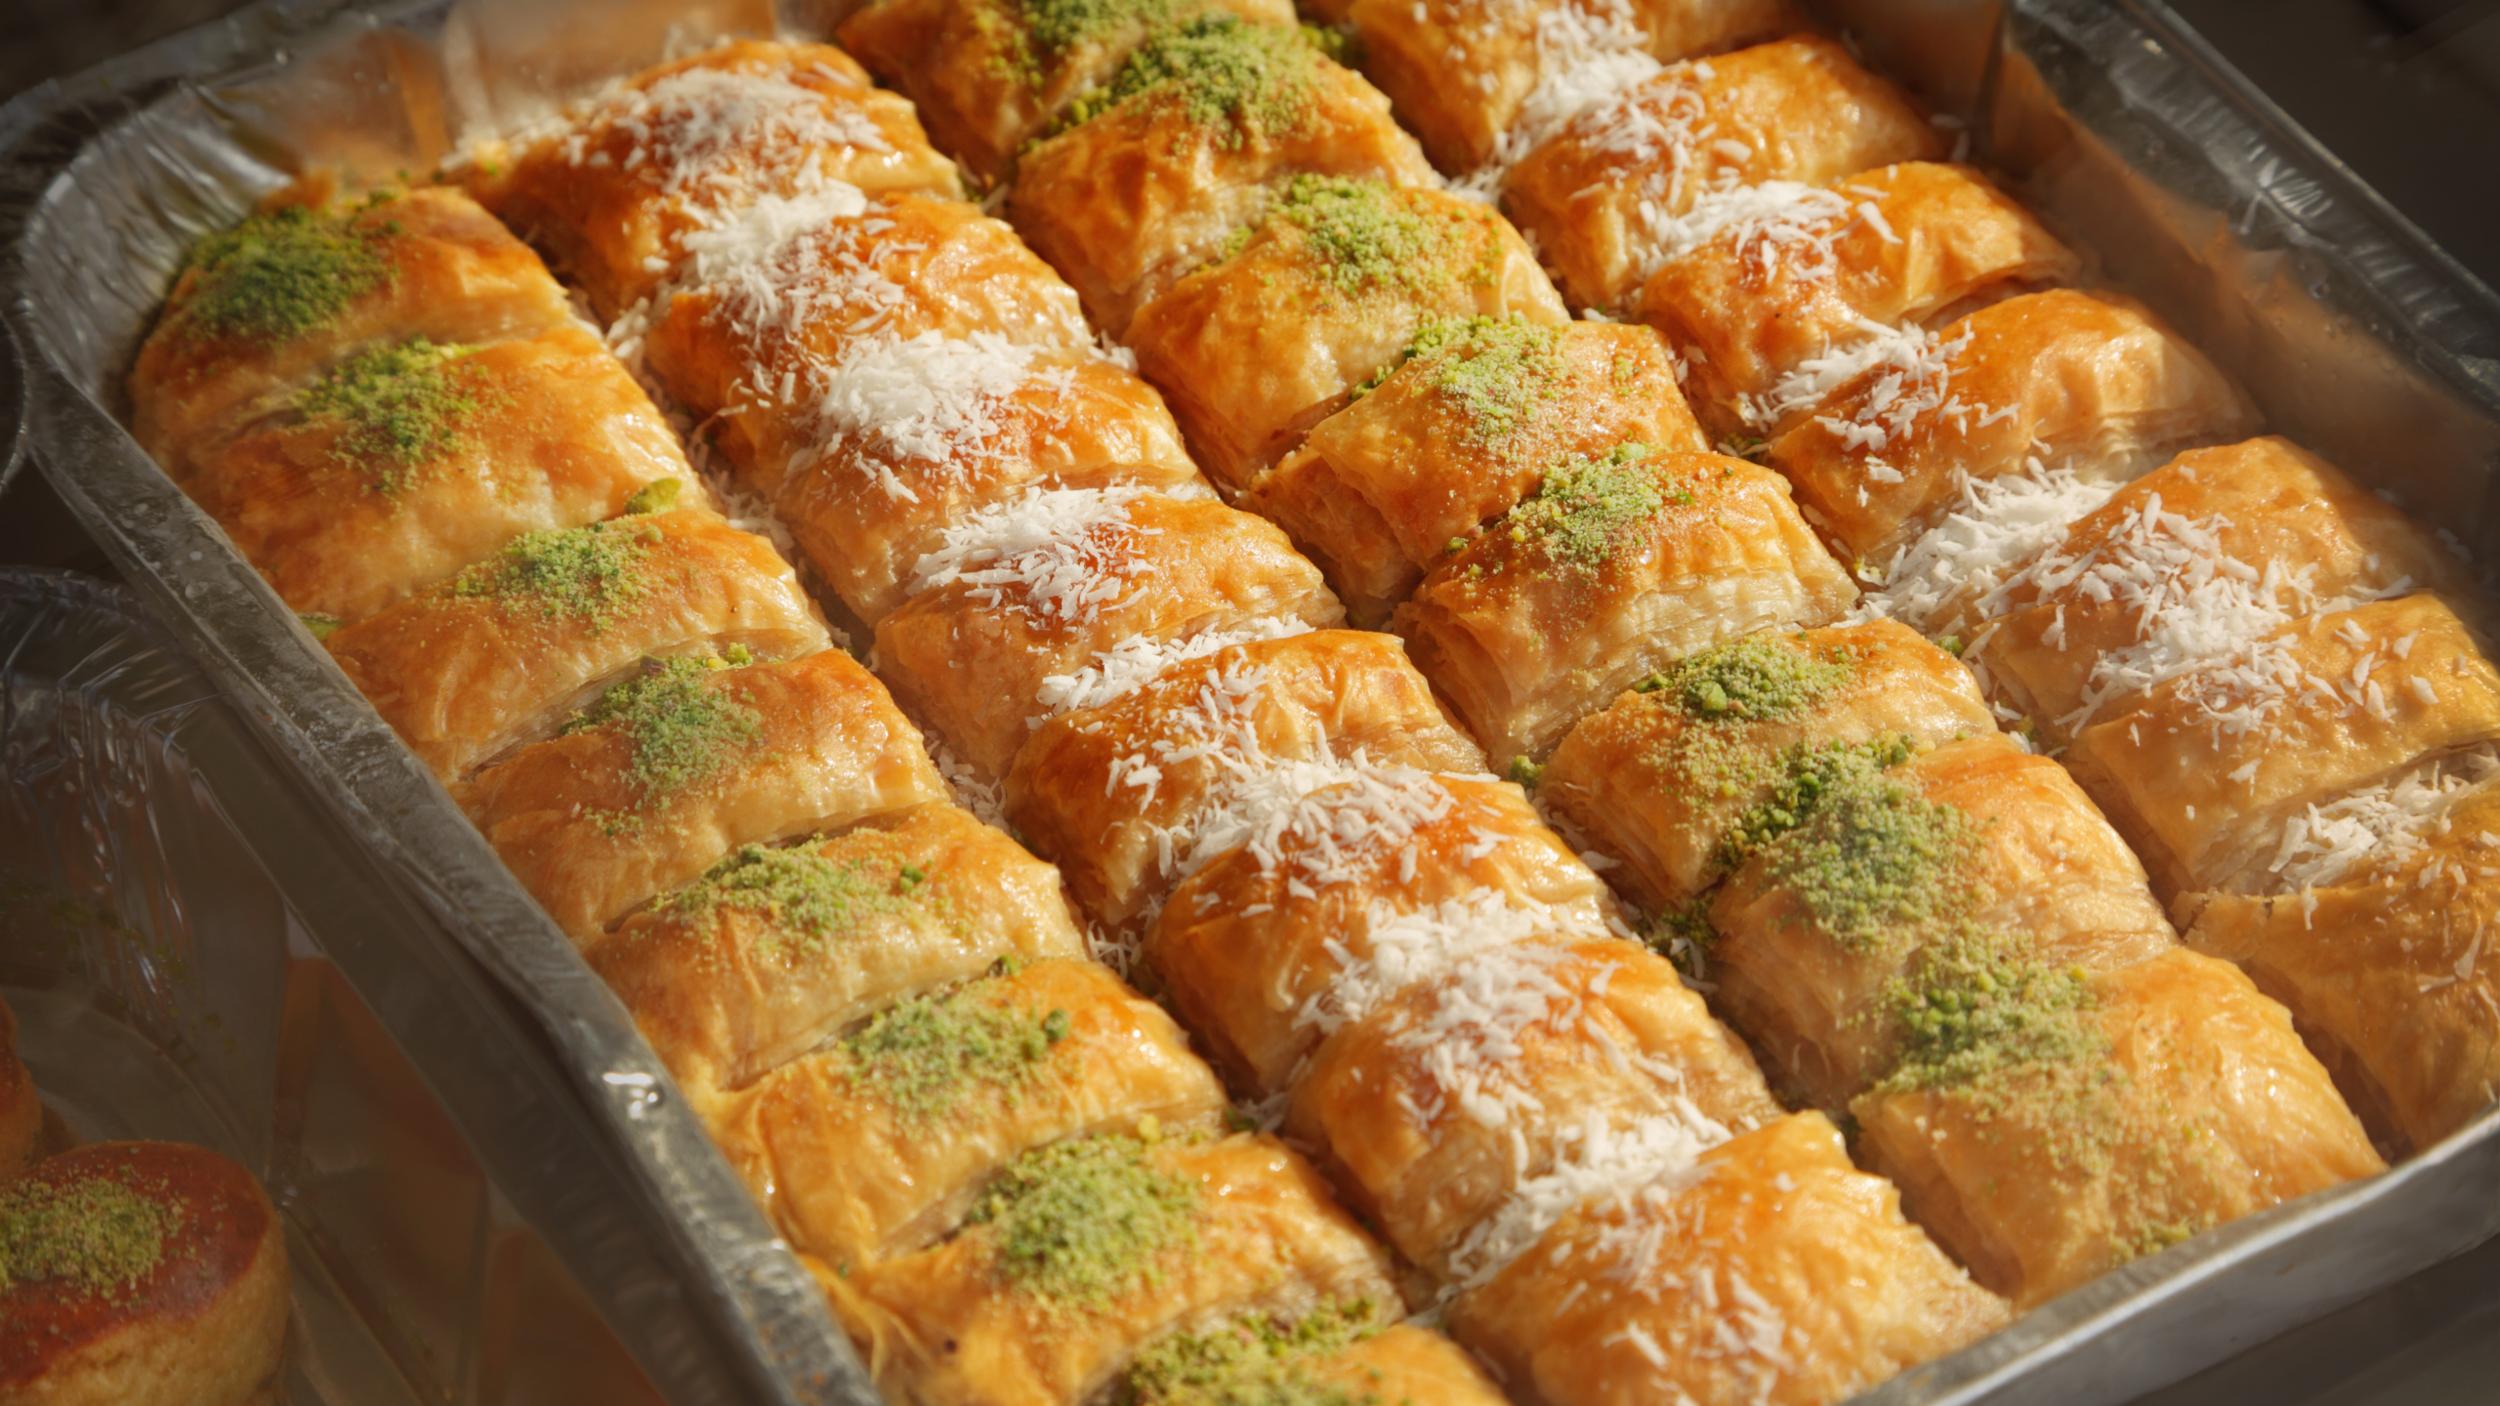 The popular Israeli dessert, Baklava.